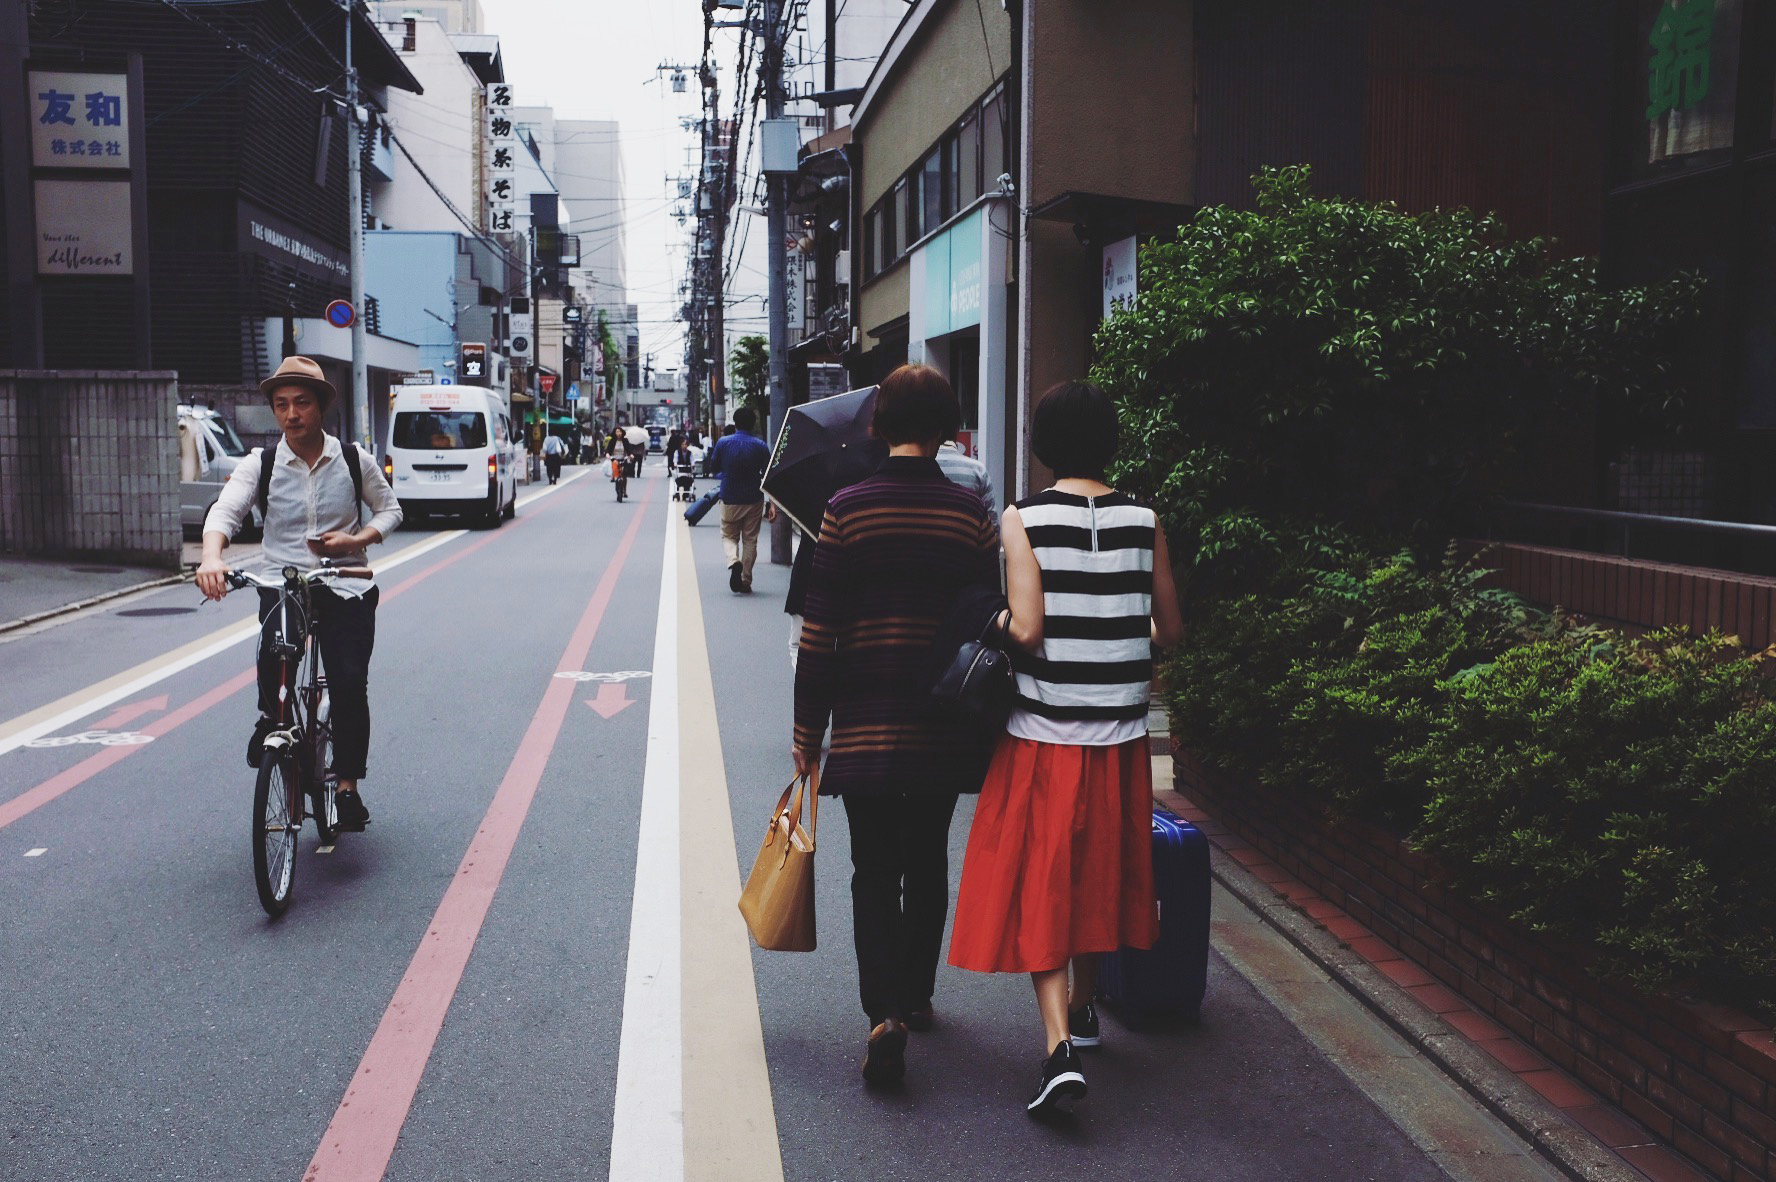 japan_lkbkjpnec_37b.jpg